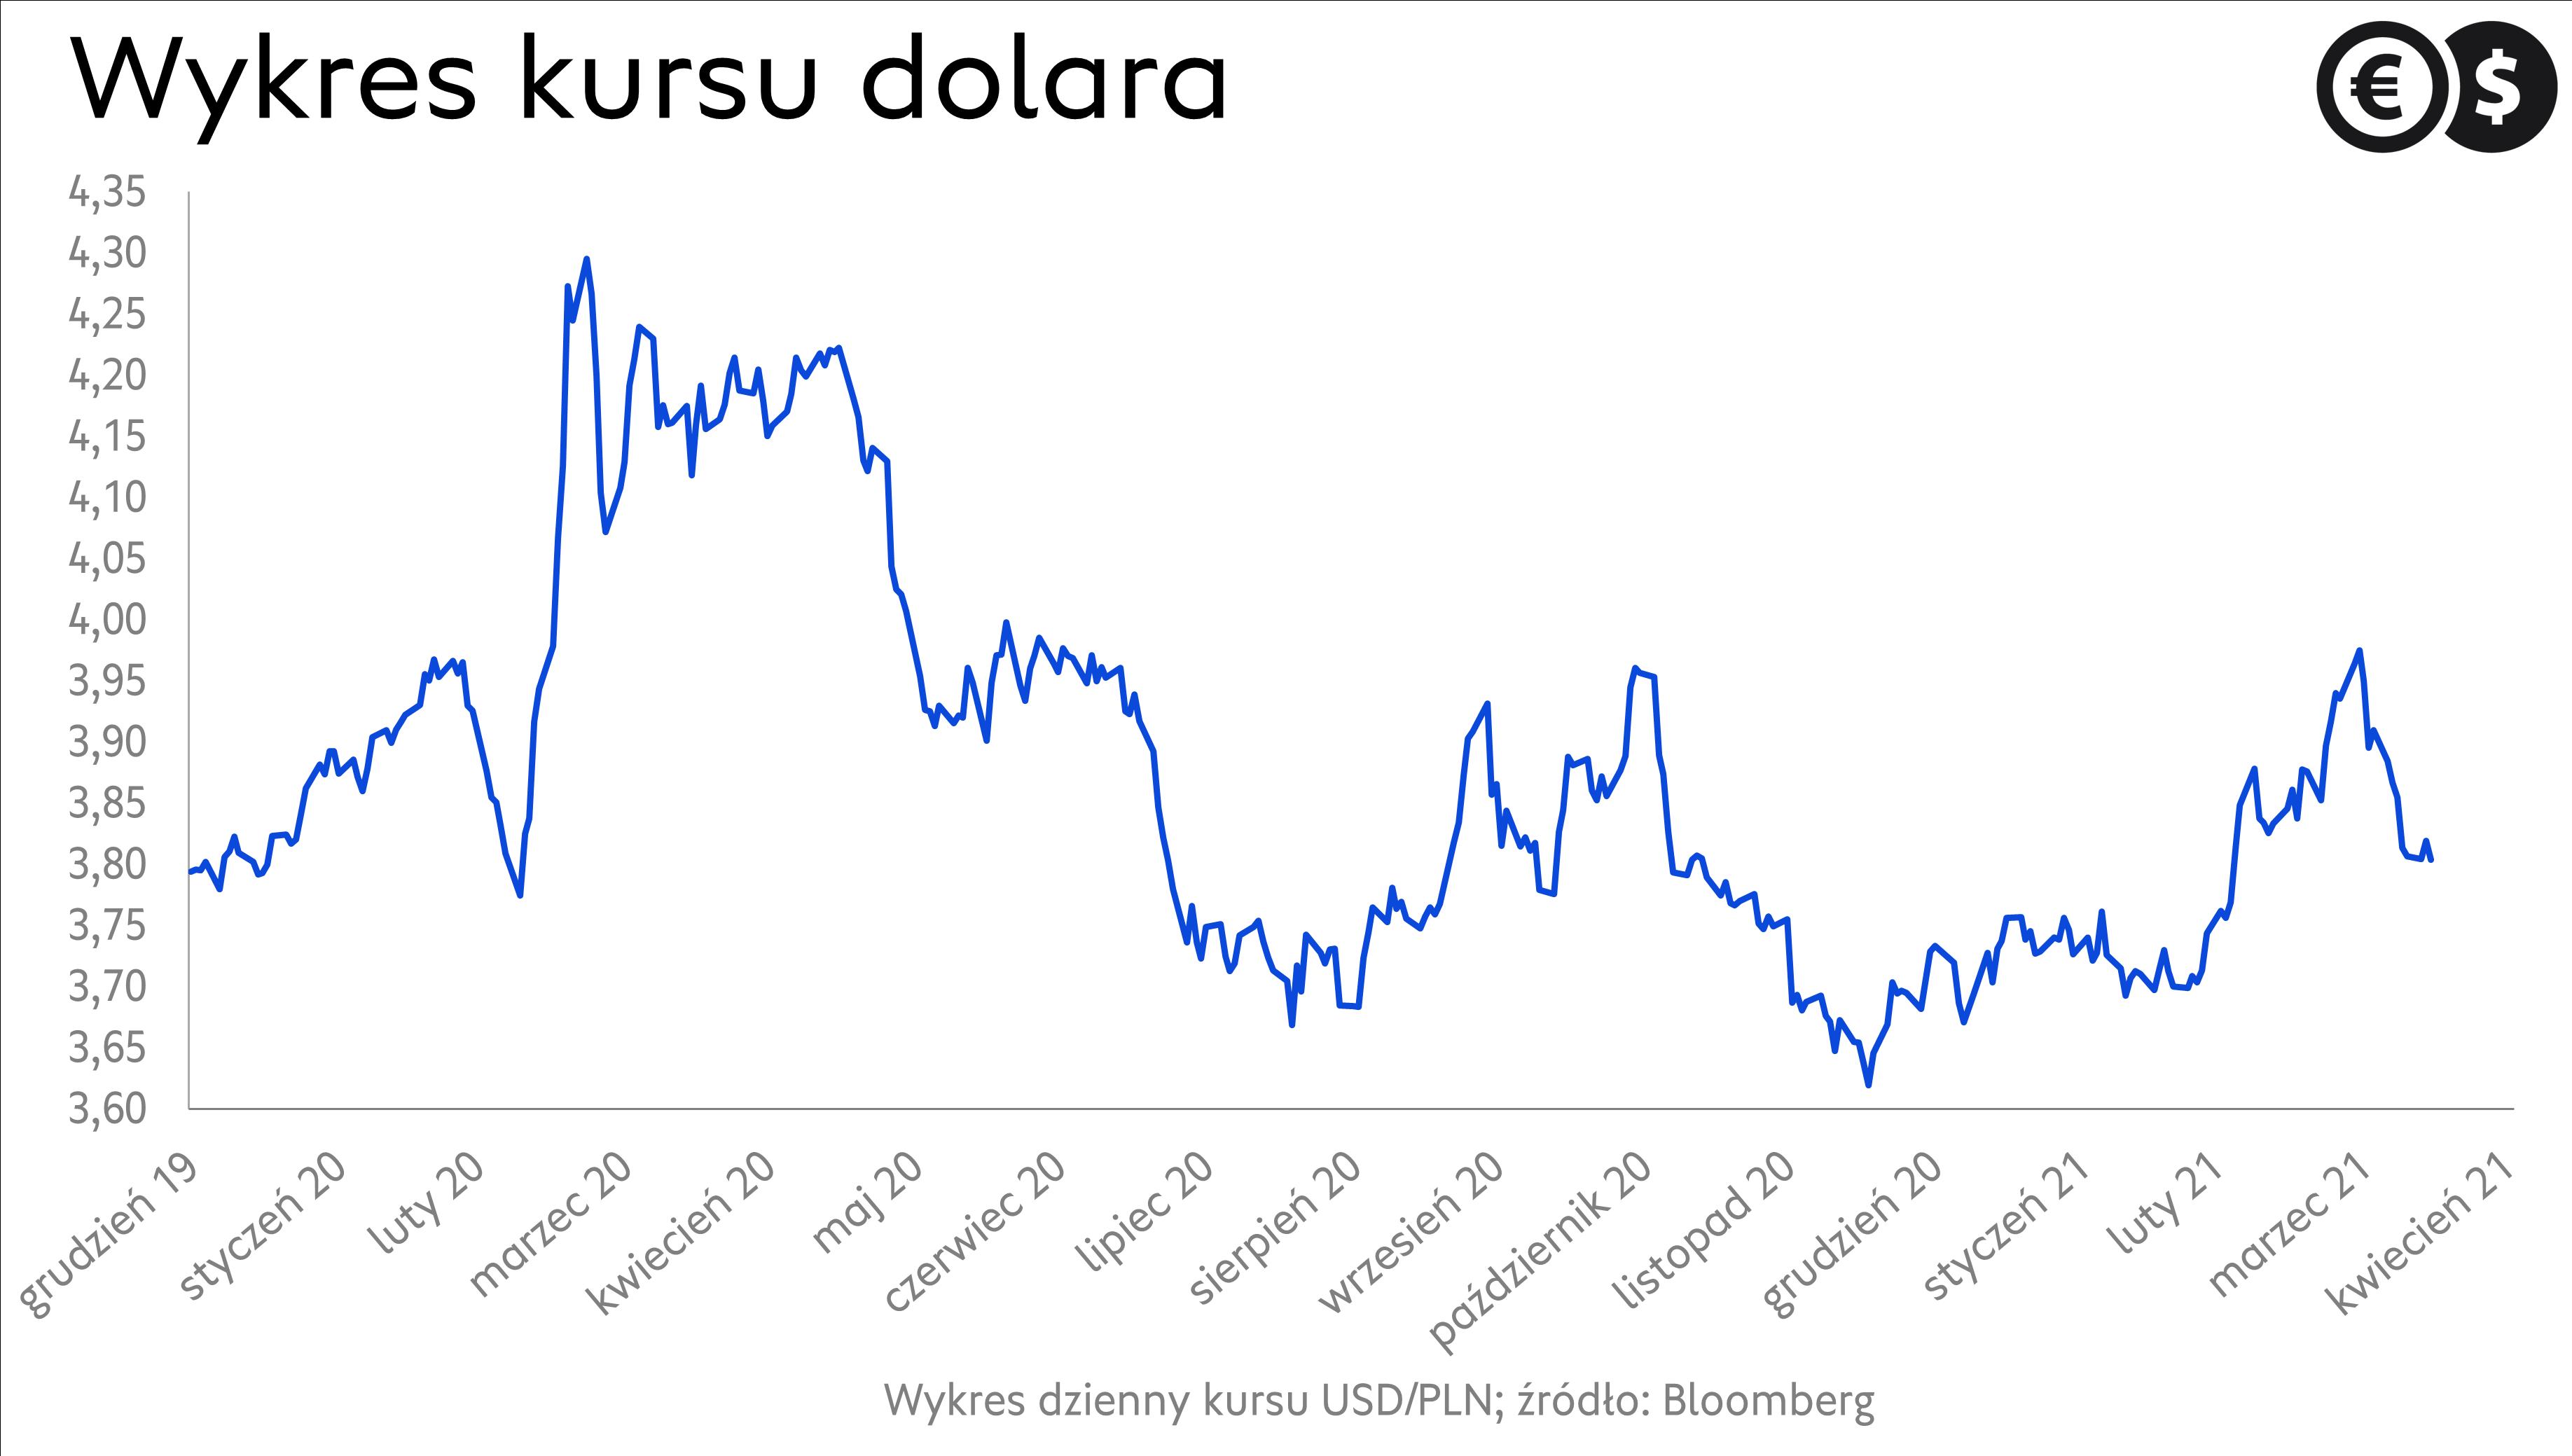 Kurs dolara: źródło: Bloomberg